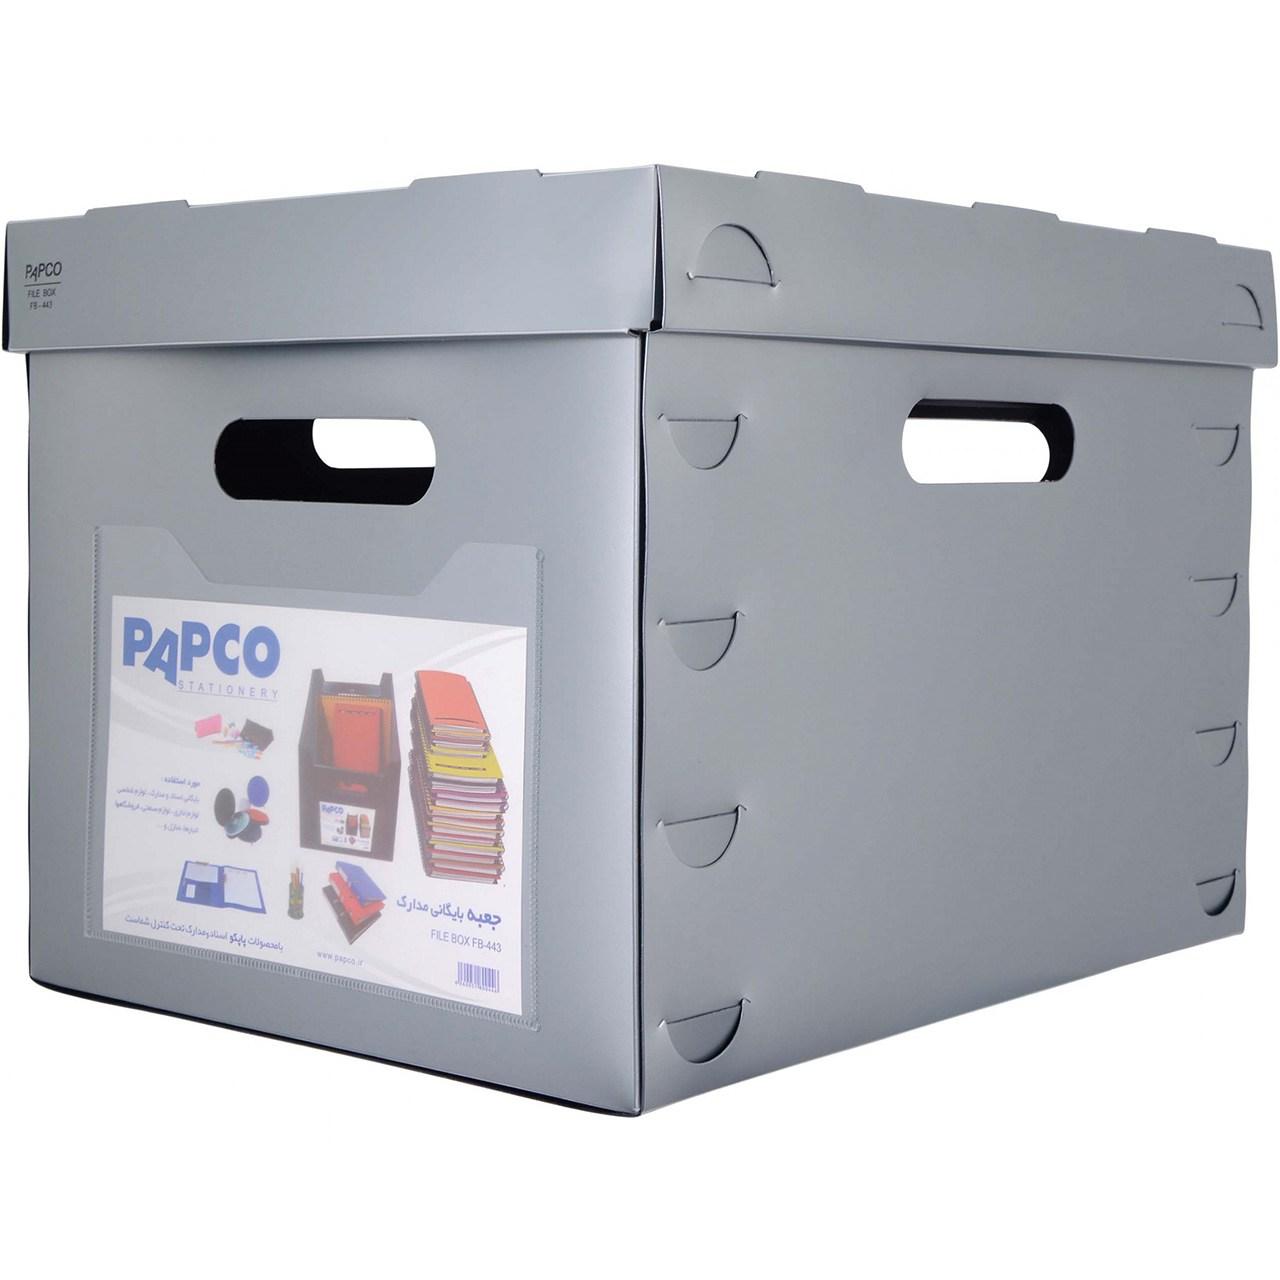 جعبه مدارک پاپکو کد FB-443